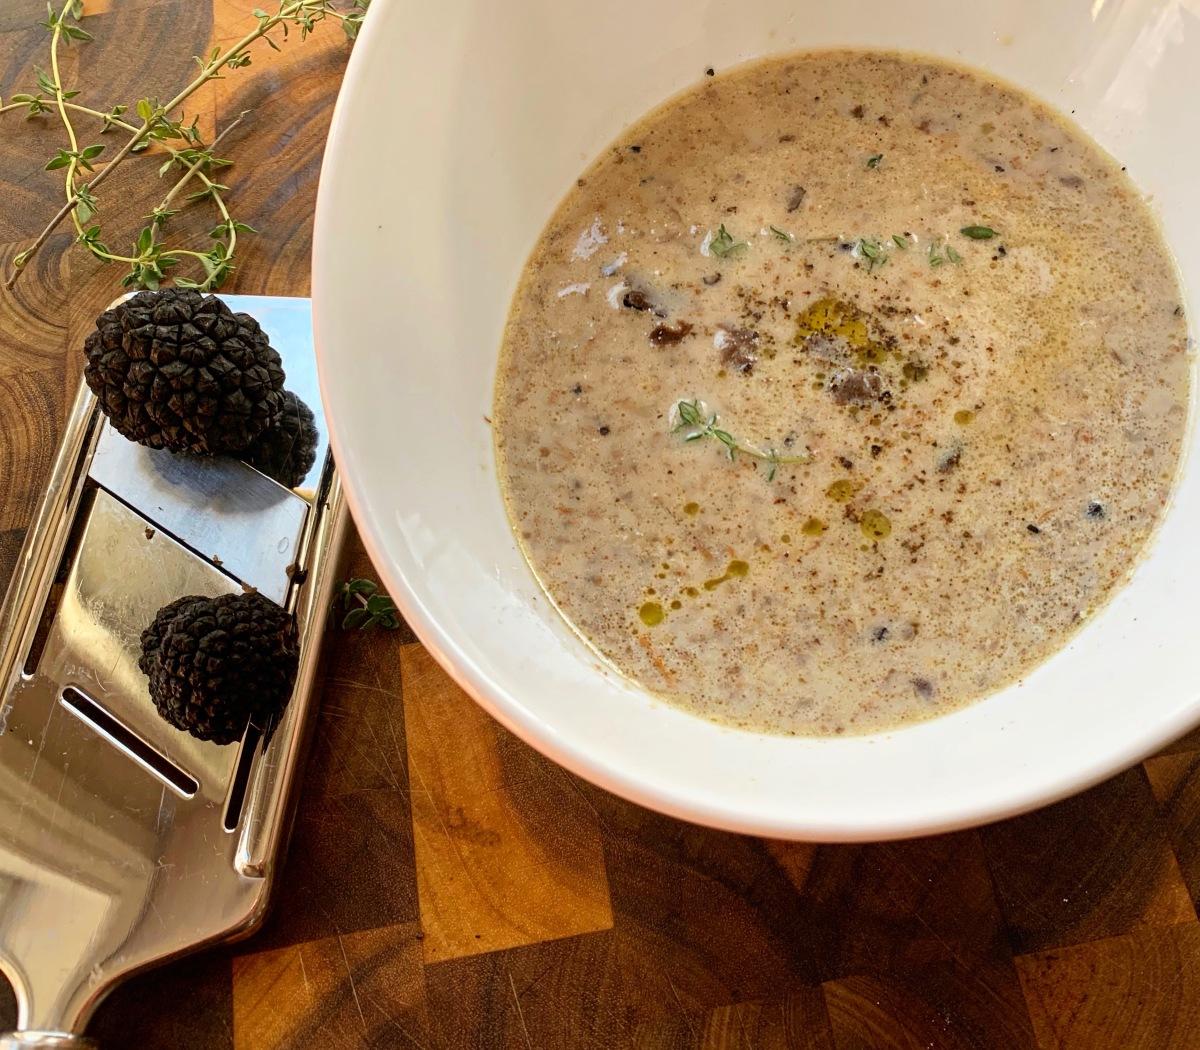 Creamy Truffle Mushroom Soup